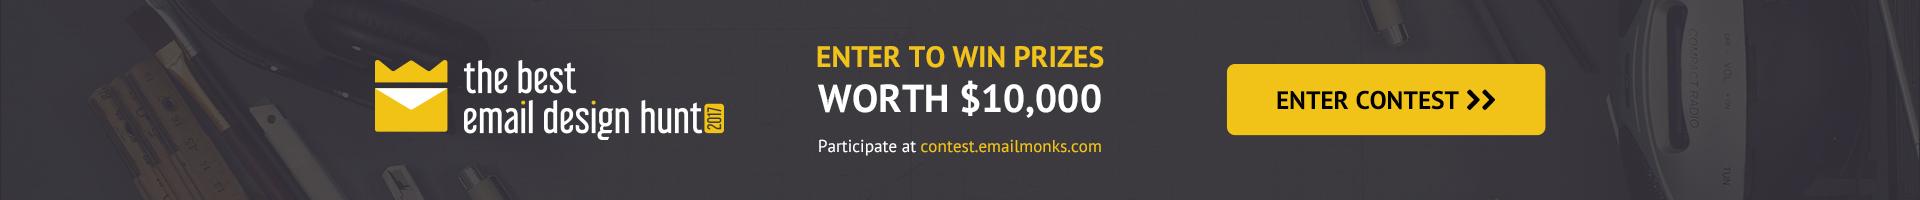 Emailmonks Contest